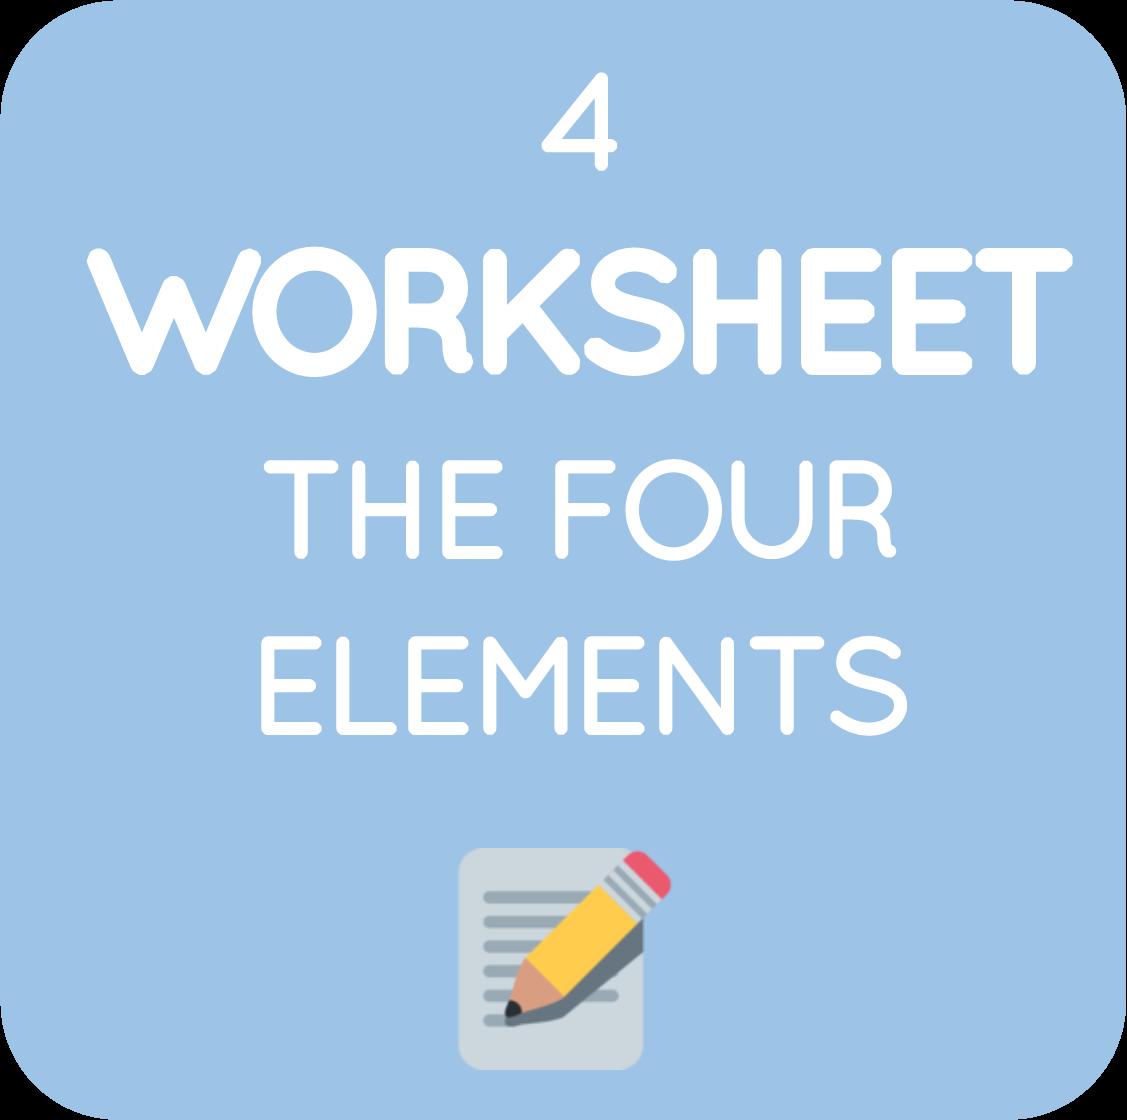 10-tarot worksheet #4.png